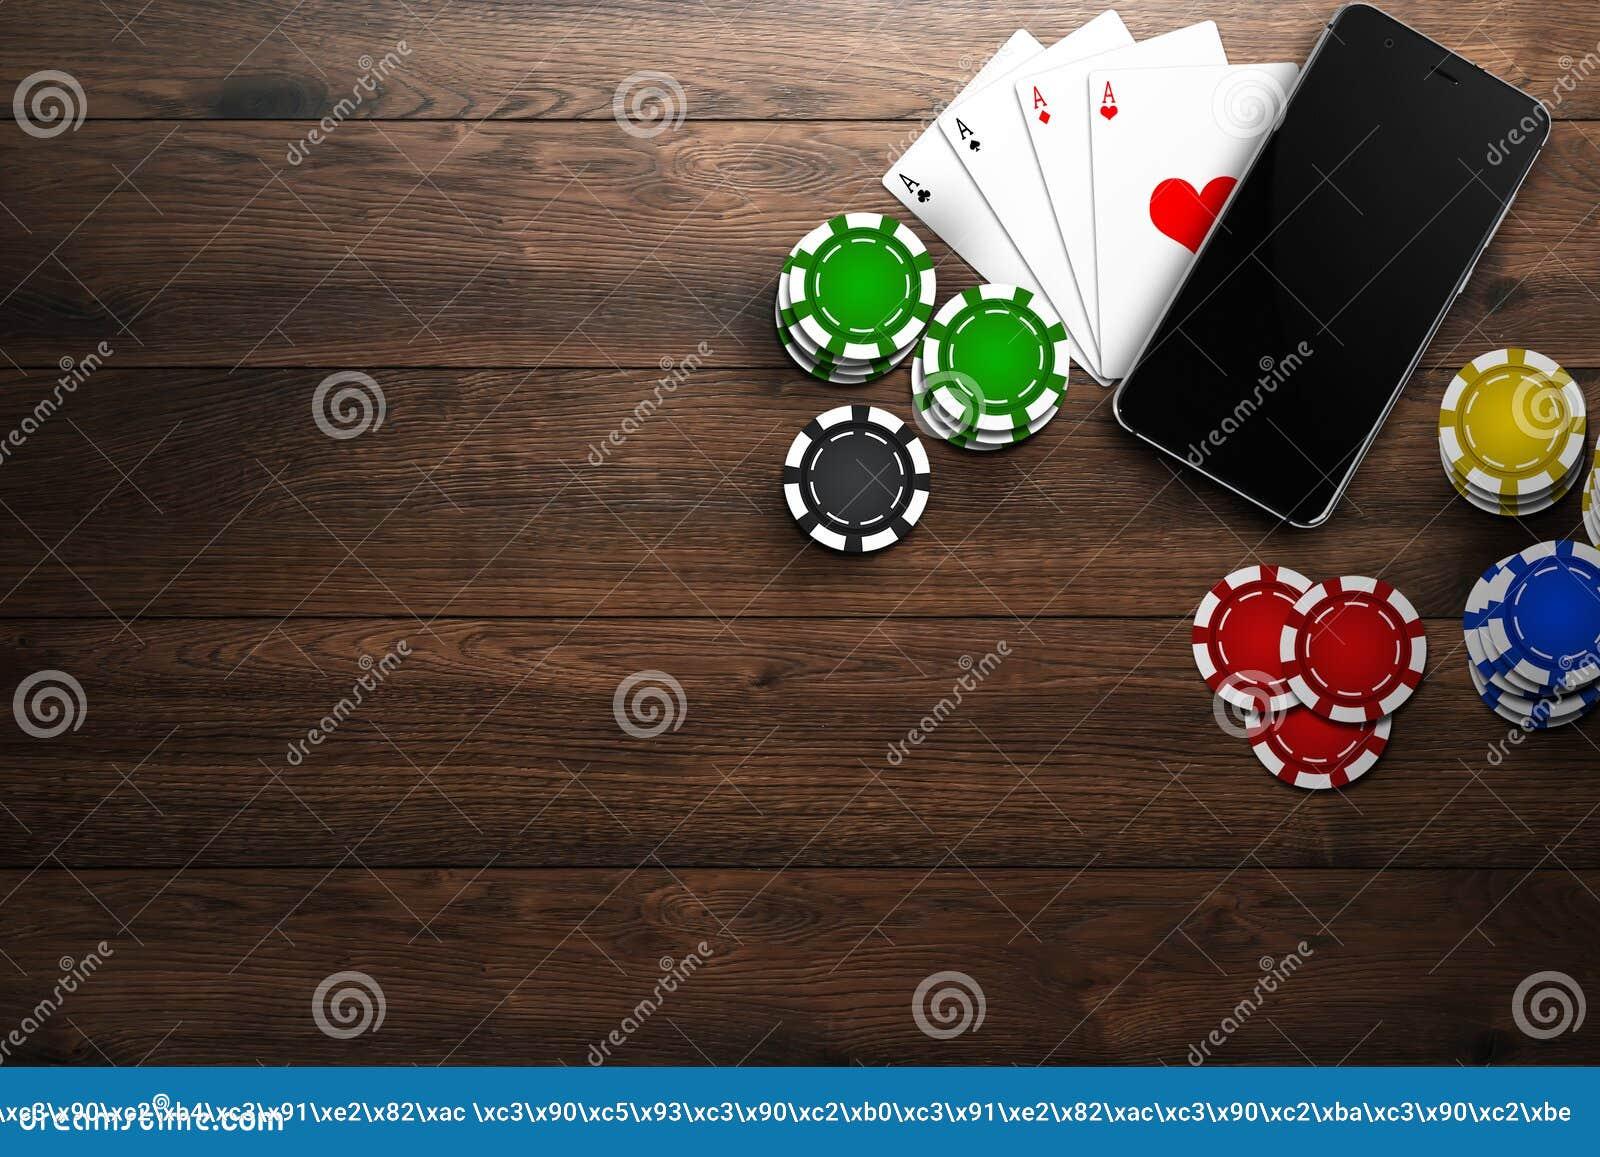 thousands online casinos